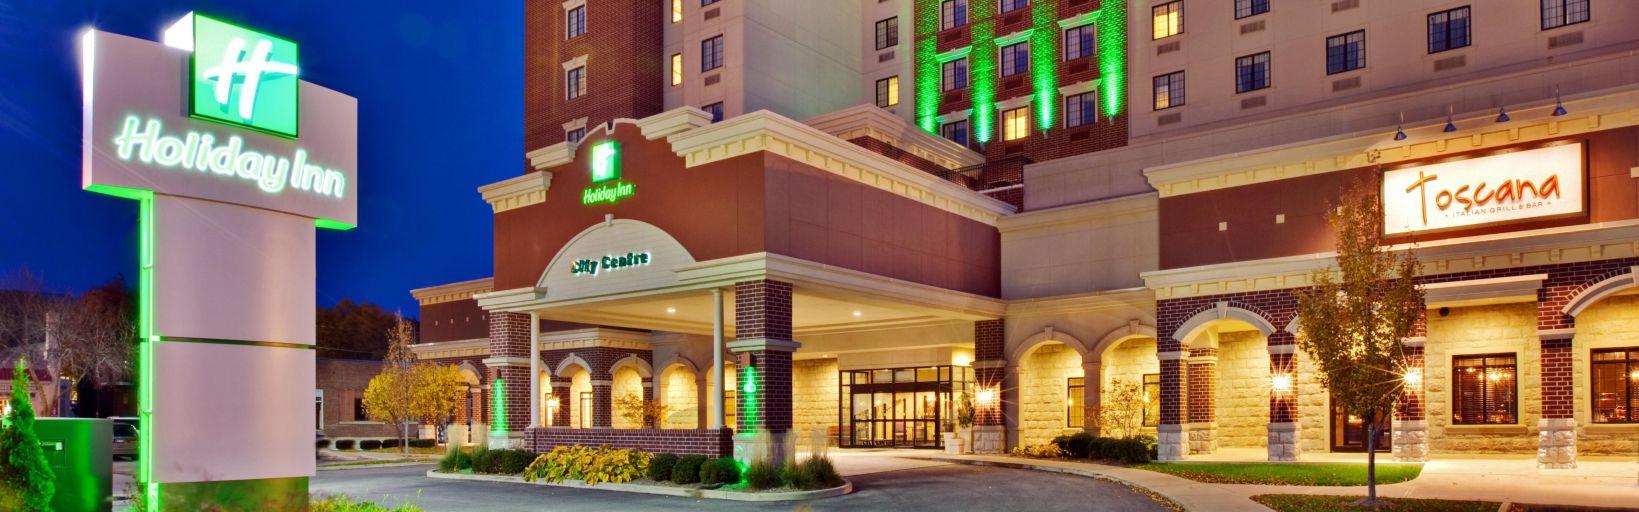 Hotels in Lafayette, Indiana | Holiday Inn Lafayette | IHG